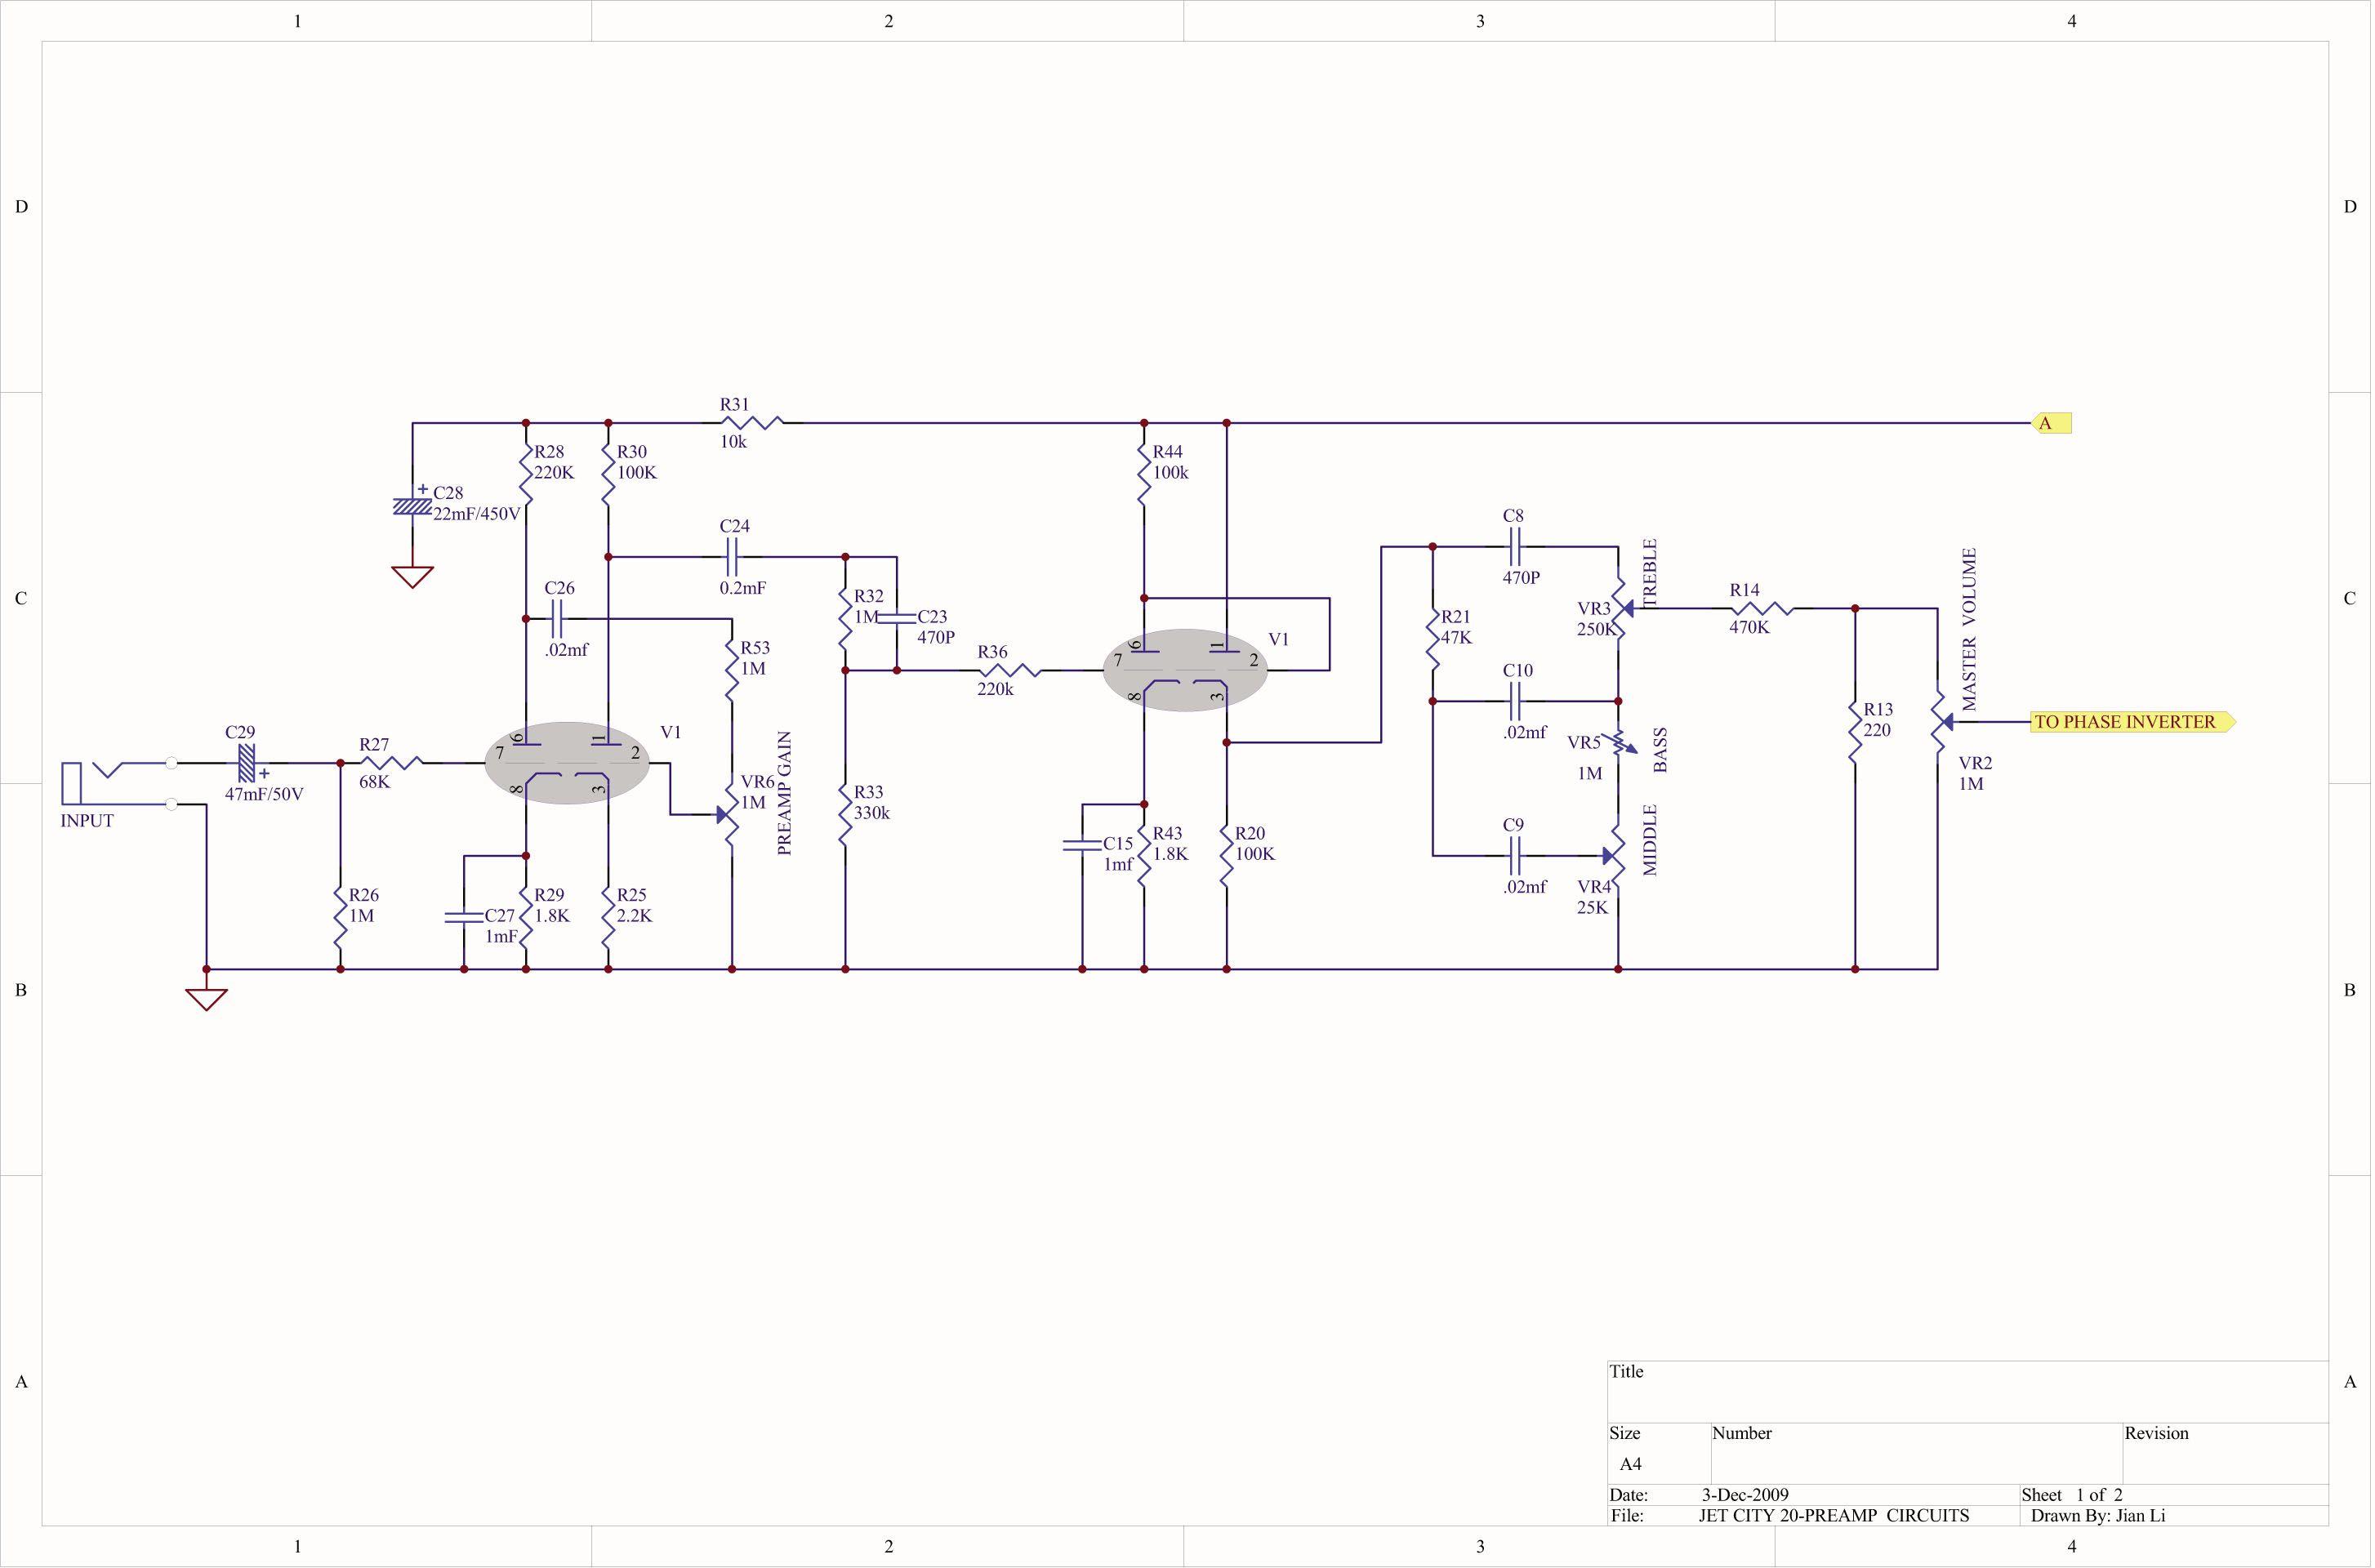 Jca22h Schematic Wire Center Toshiba Color Tv 34hf84 Service Manual Application Wiring Diagram U2022 Rh Diagramnet Today